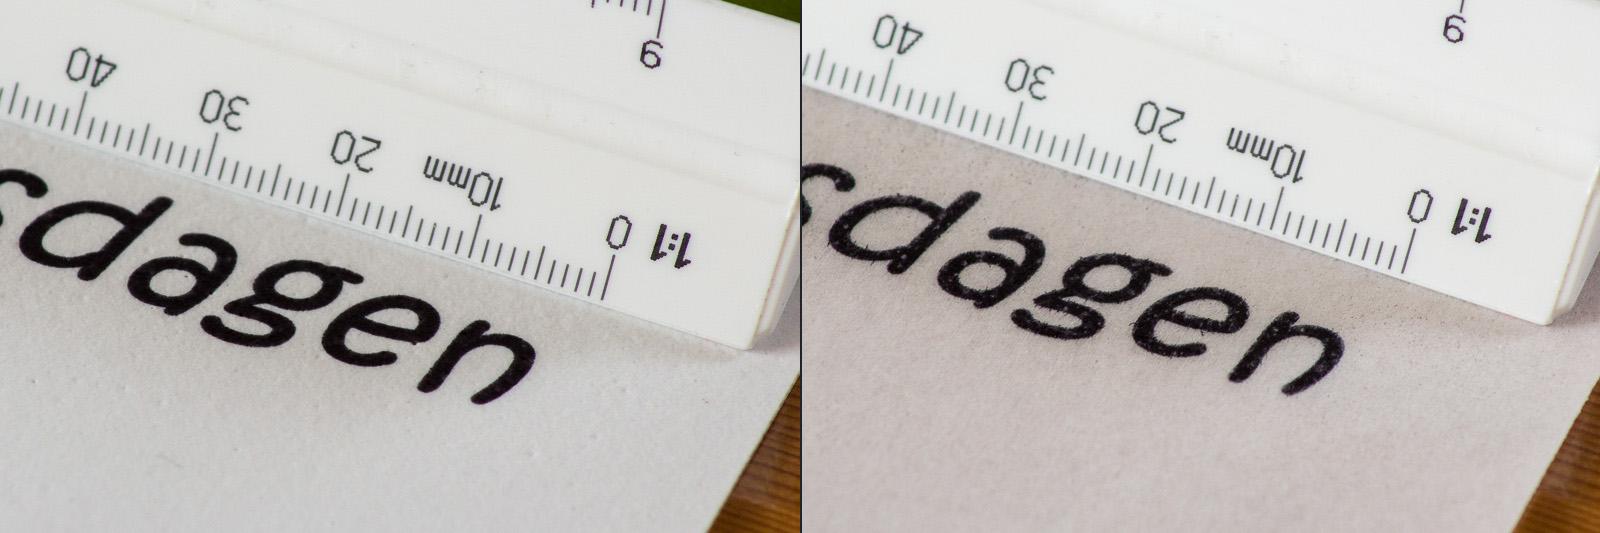 printer til sukkerpapir